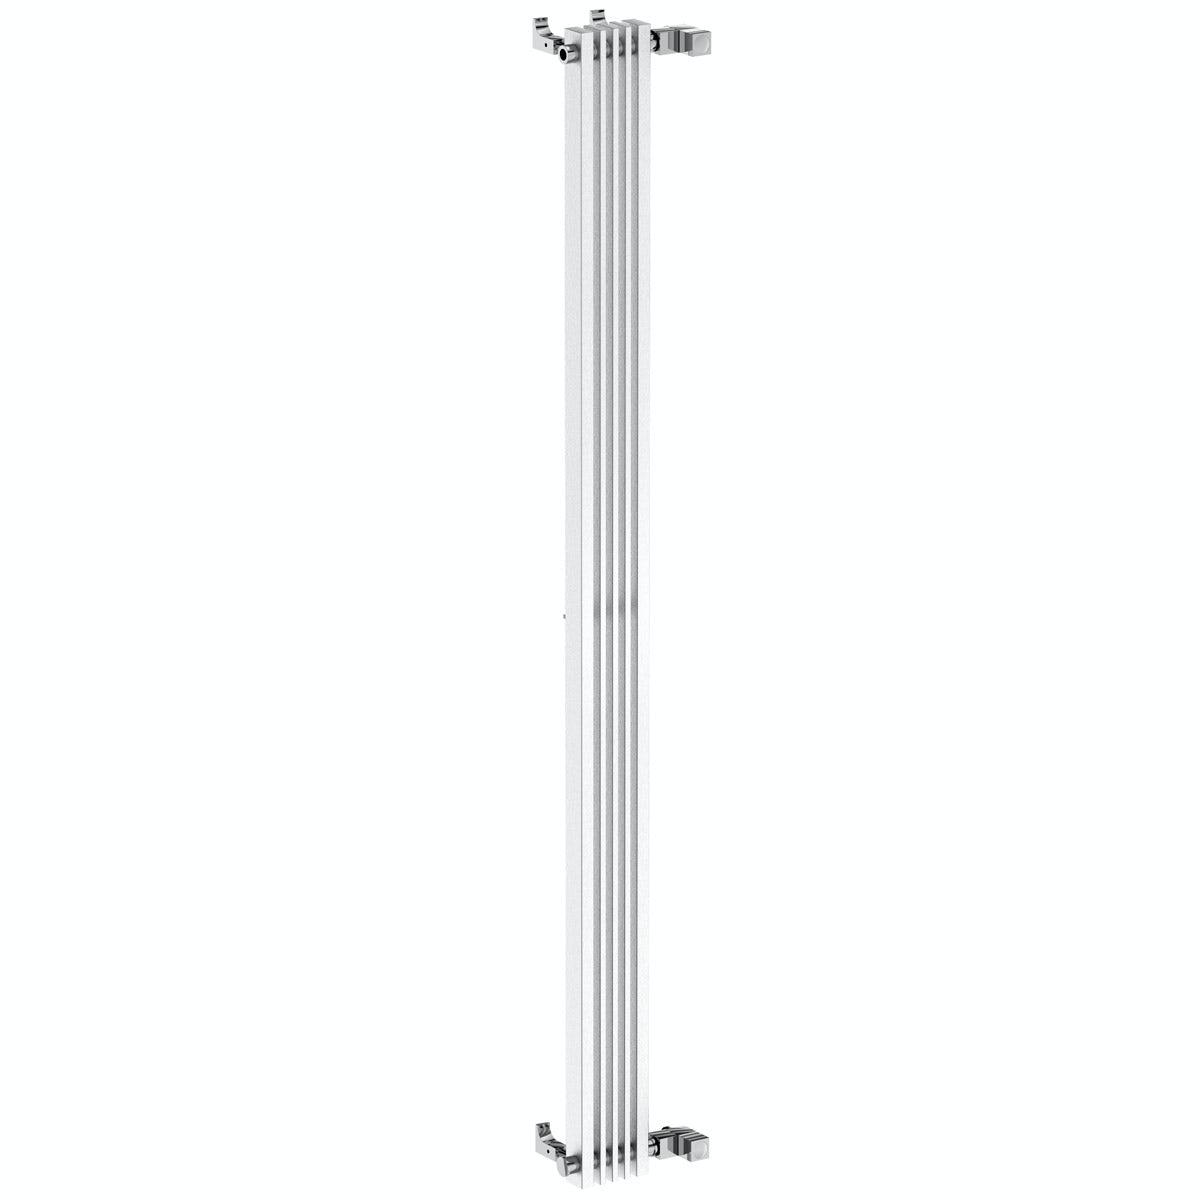 Cadence vertical radiator 1600 x 140